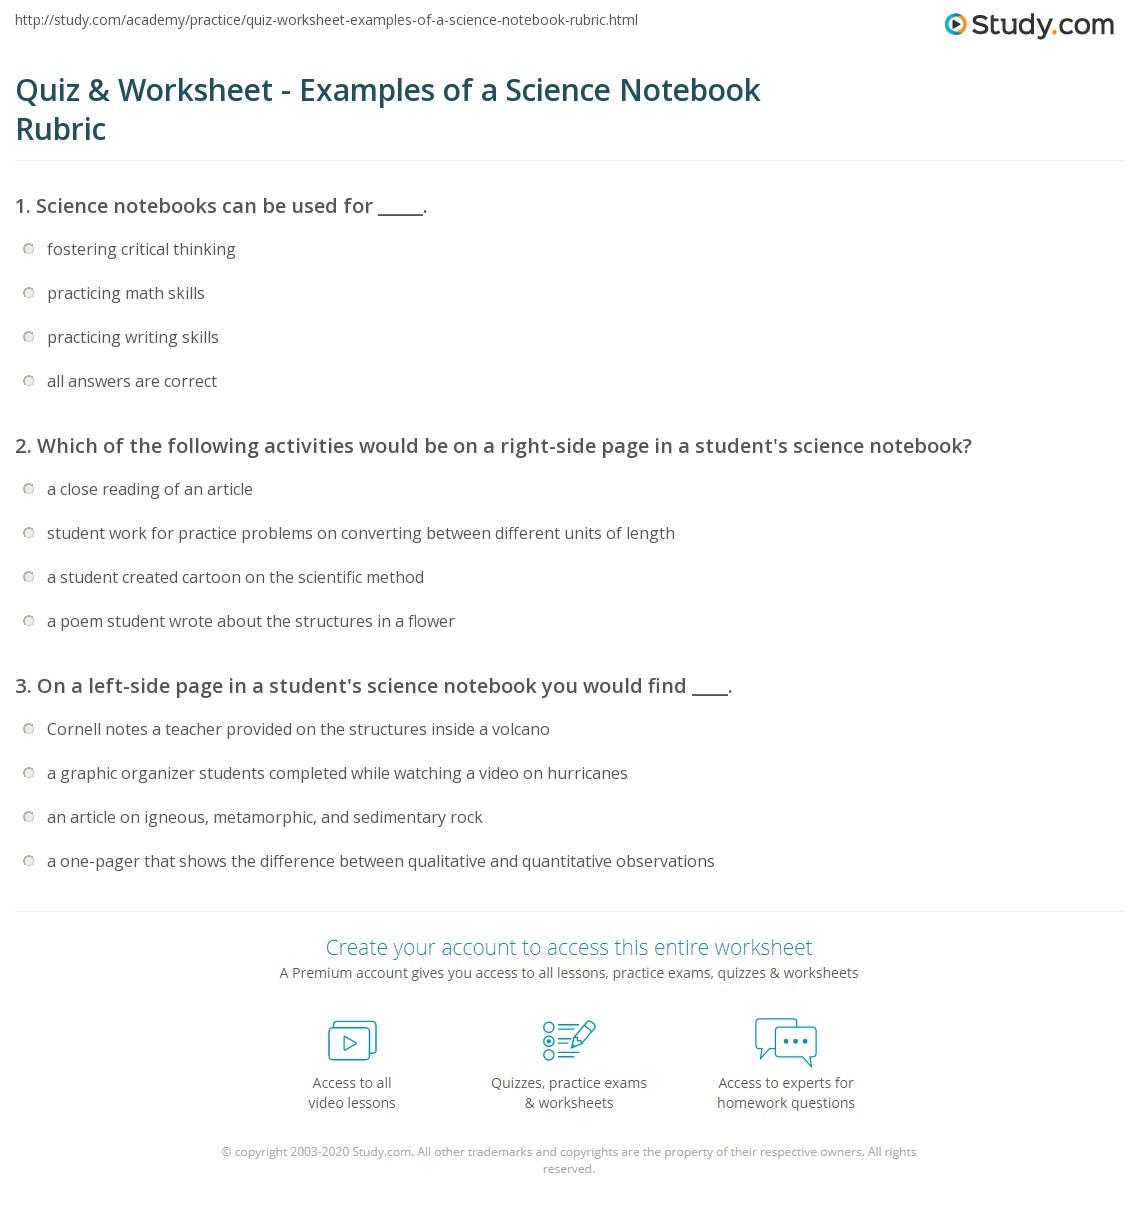 quiz worksheet examples of a science notebook rubric. Black Bedroom Furniture Sets. Home Design Ideas